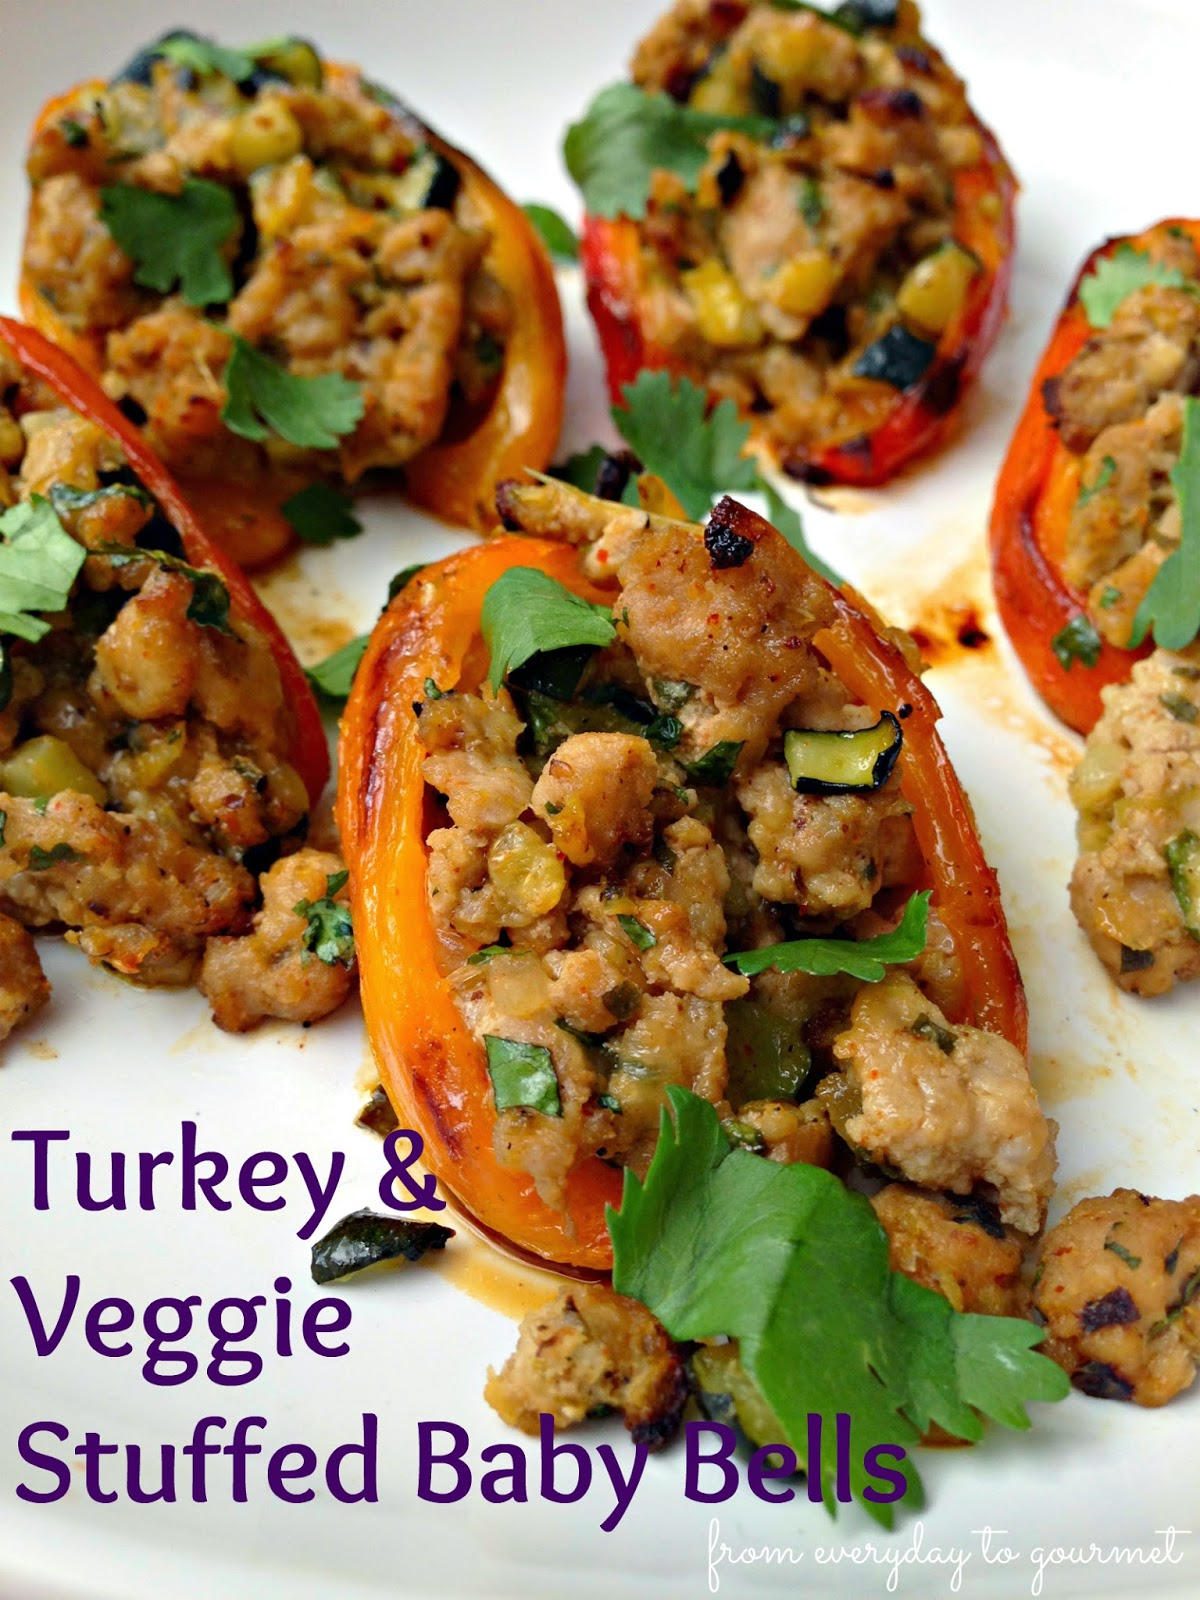 Healthy Turkey & Veggie Stuffed Baby Bell Peppers